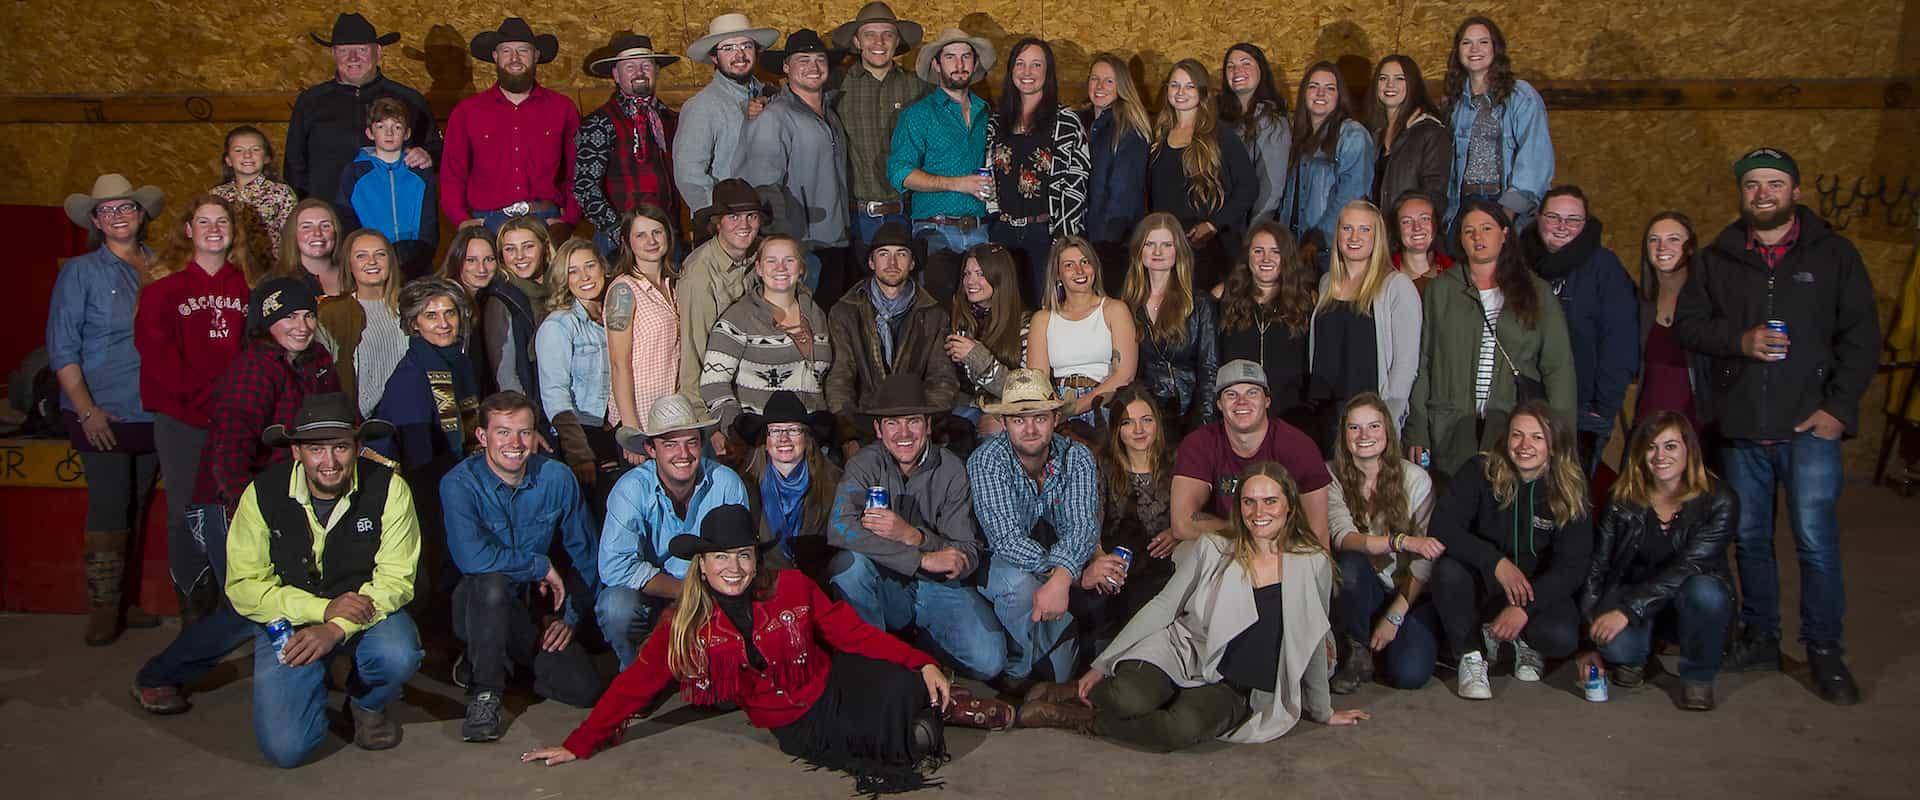 2018 Banff Trail Riders Staff Photo